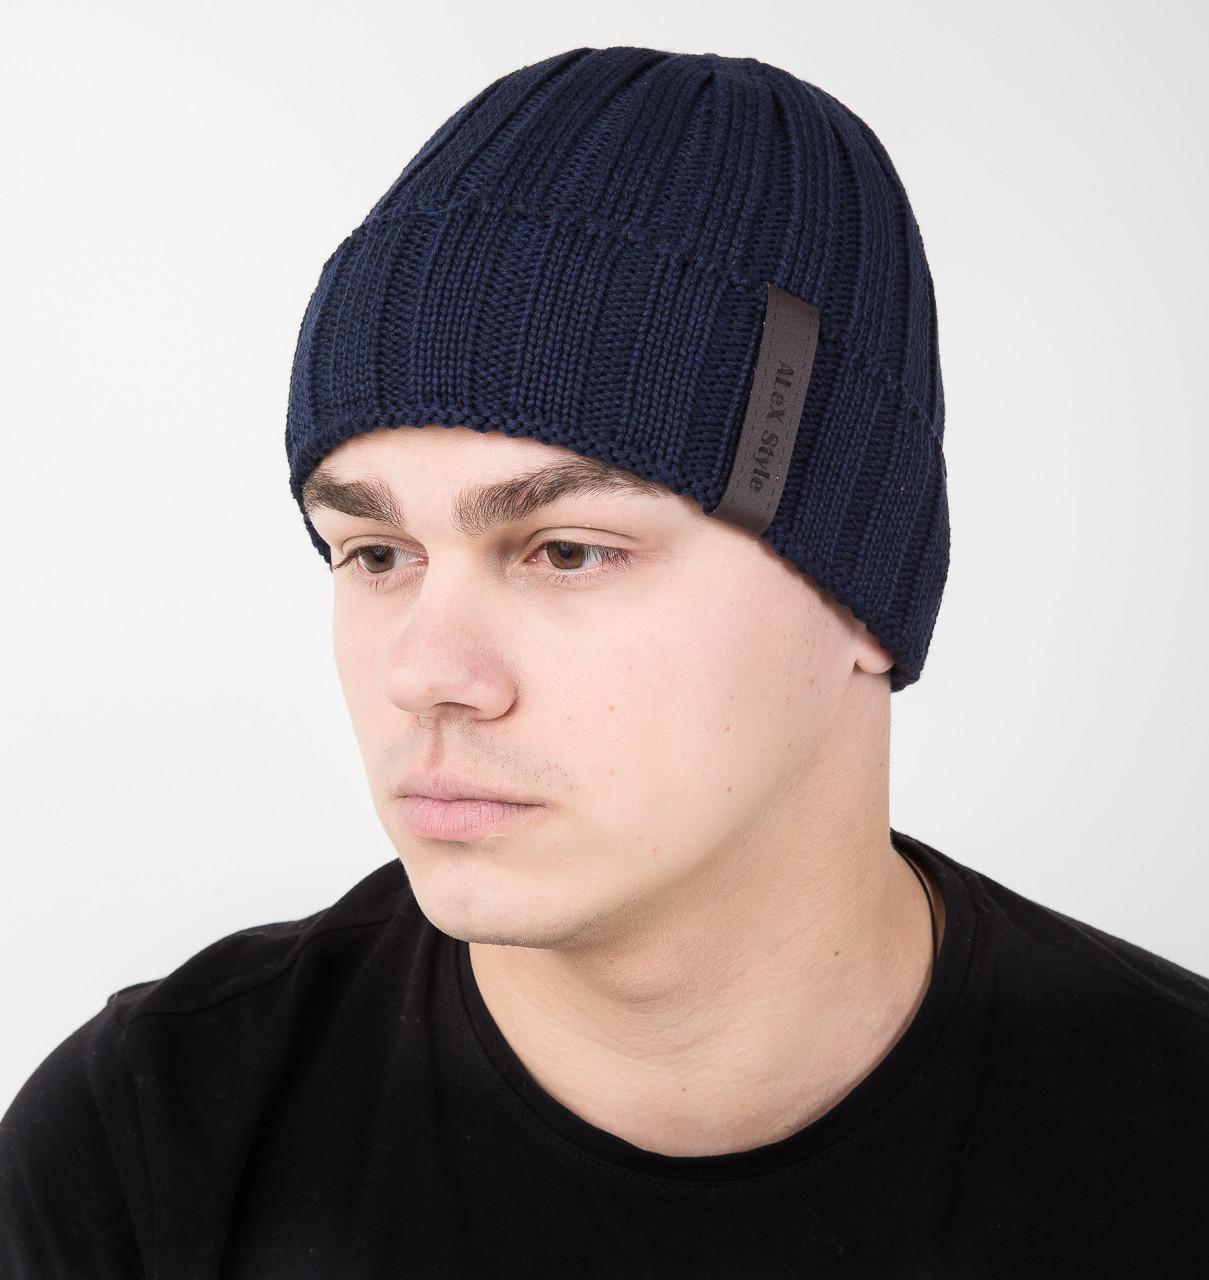 Мужская зимняя шапка с отворотом ALEX - Артикул AL17037